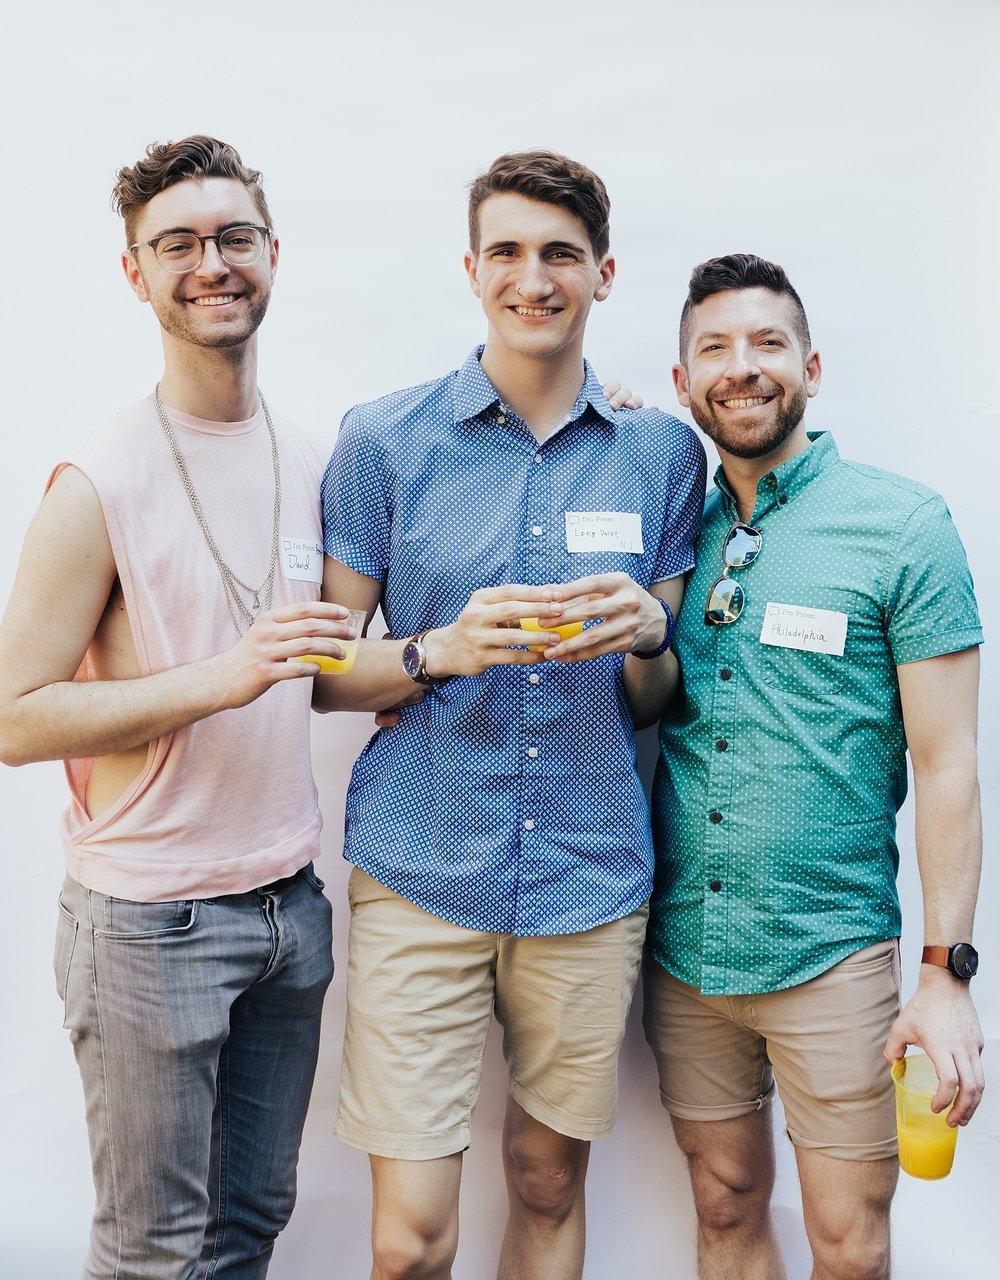 Im_From_Driftwood_Small_Joe_Mac_Creative_Photography_Gay_Queer_LGBT_Philadelphia_0265.JPG